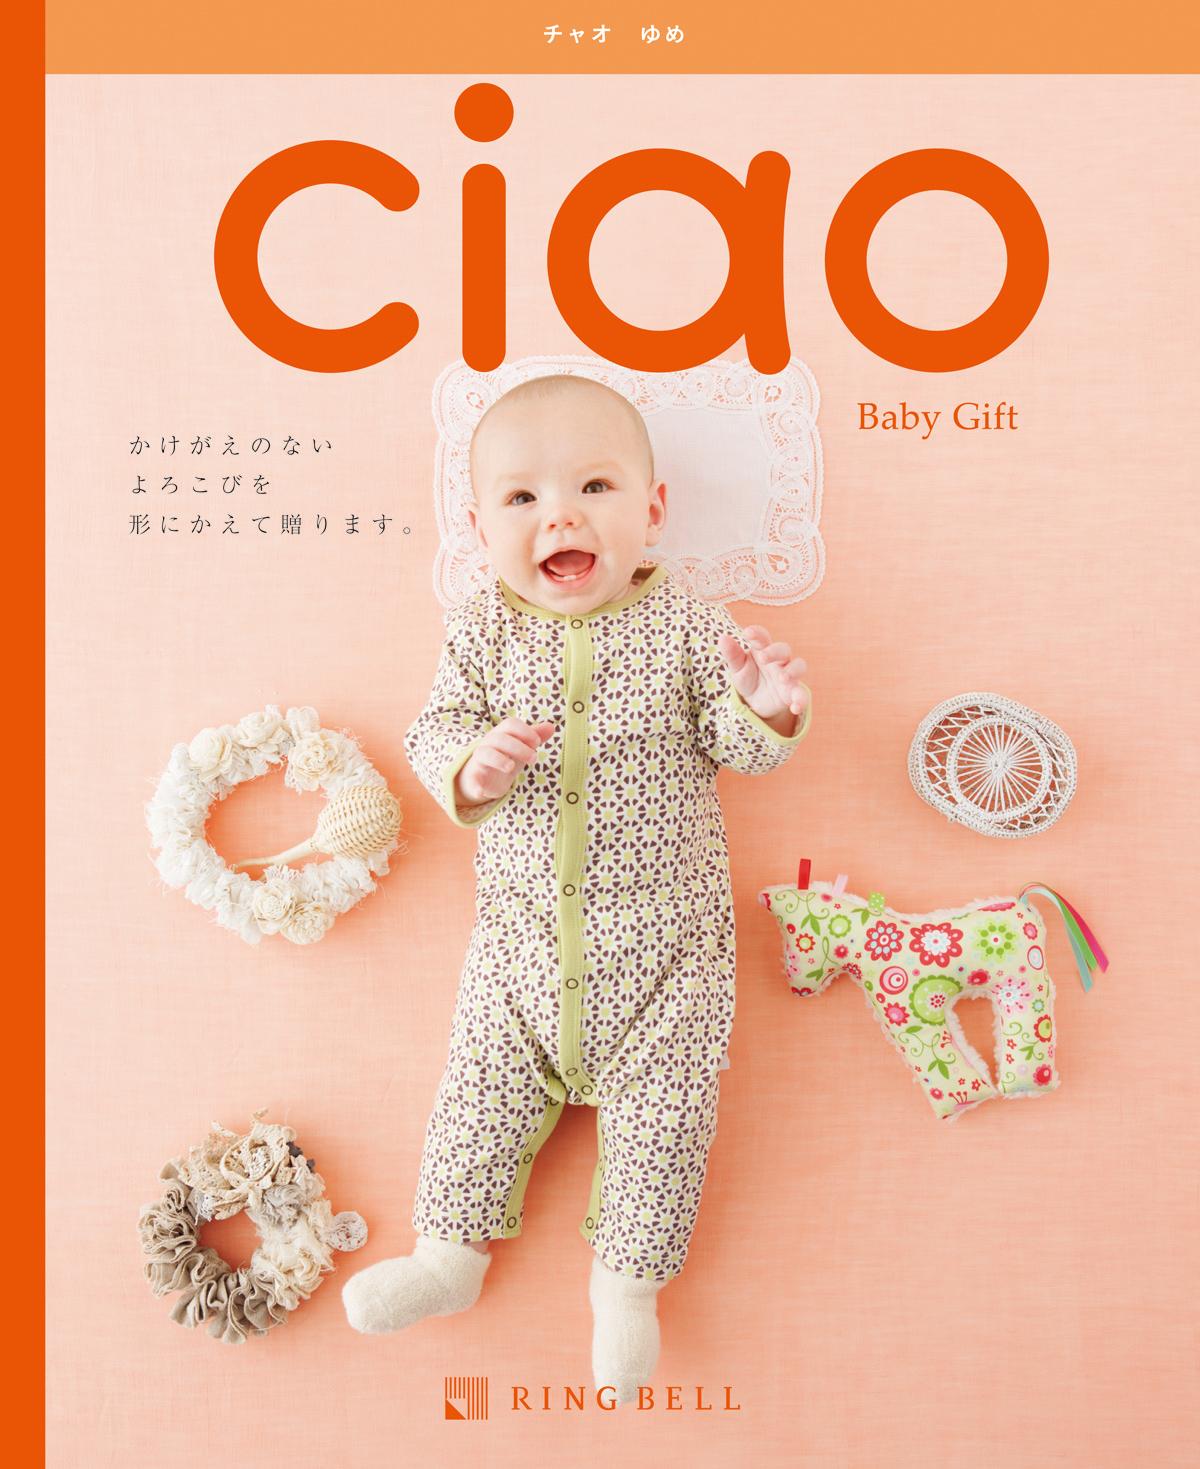 Ciao(チャオ)ゆめ